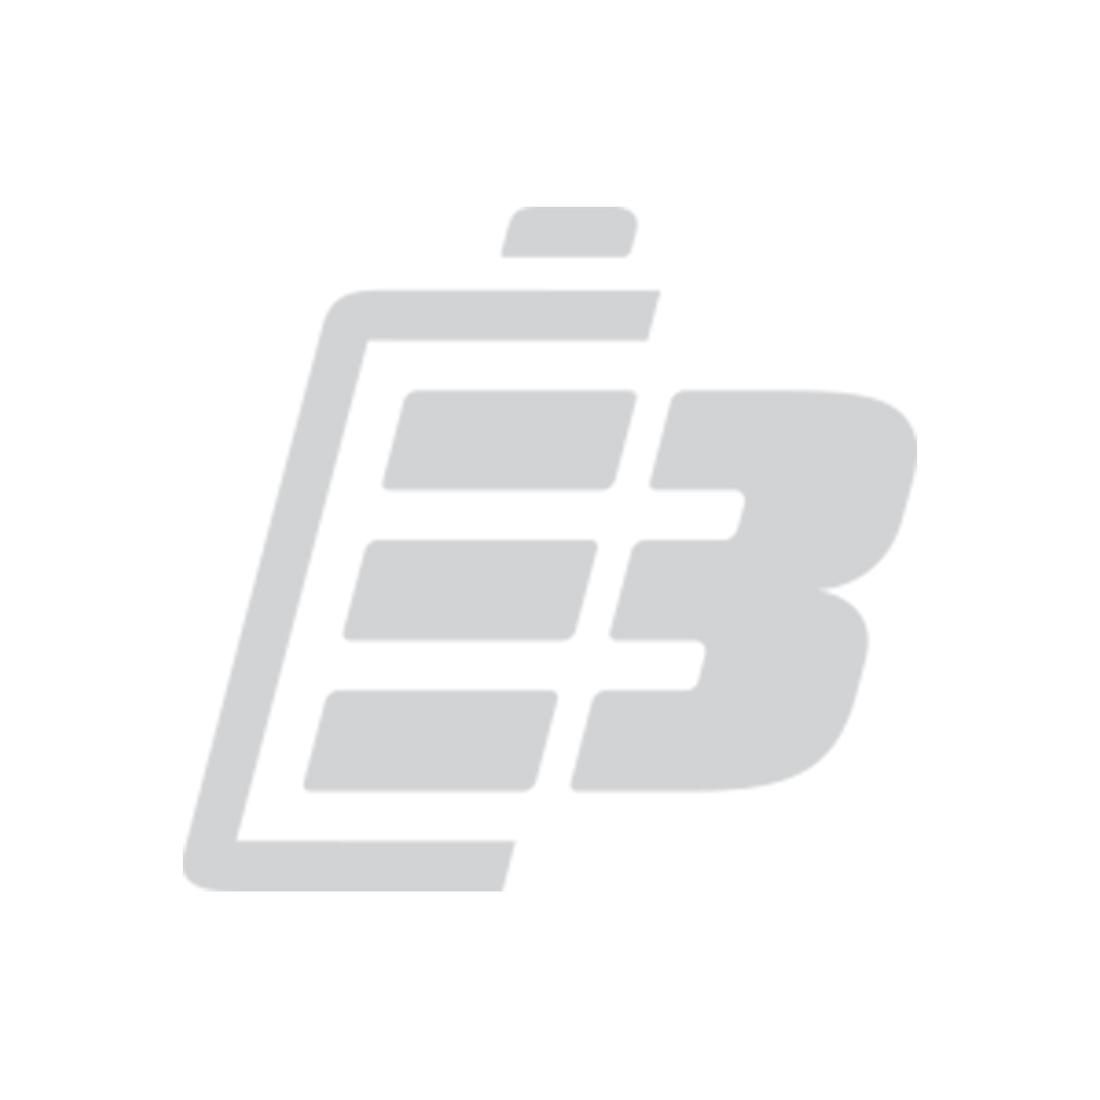 Smartphone battery LG Prada KE850_1